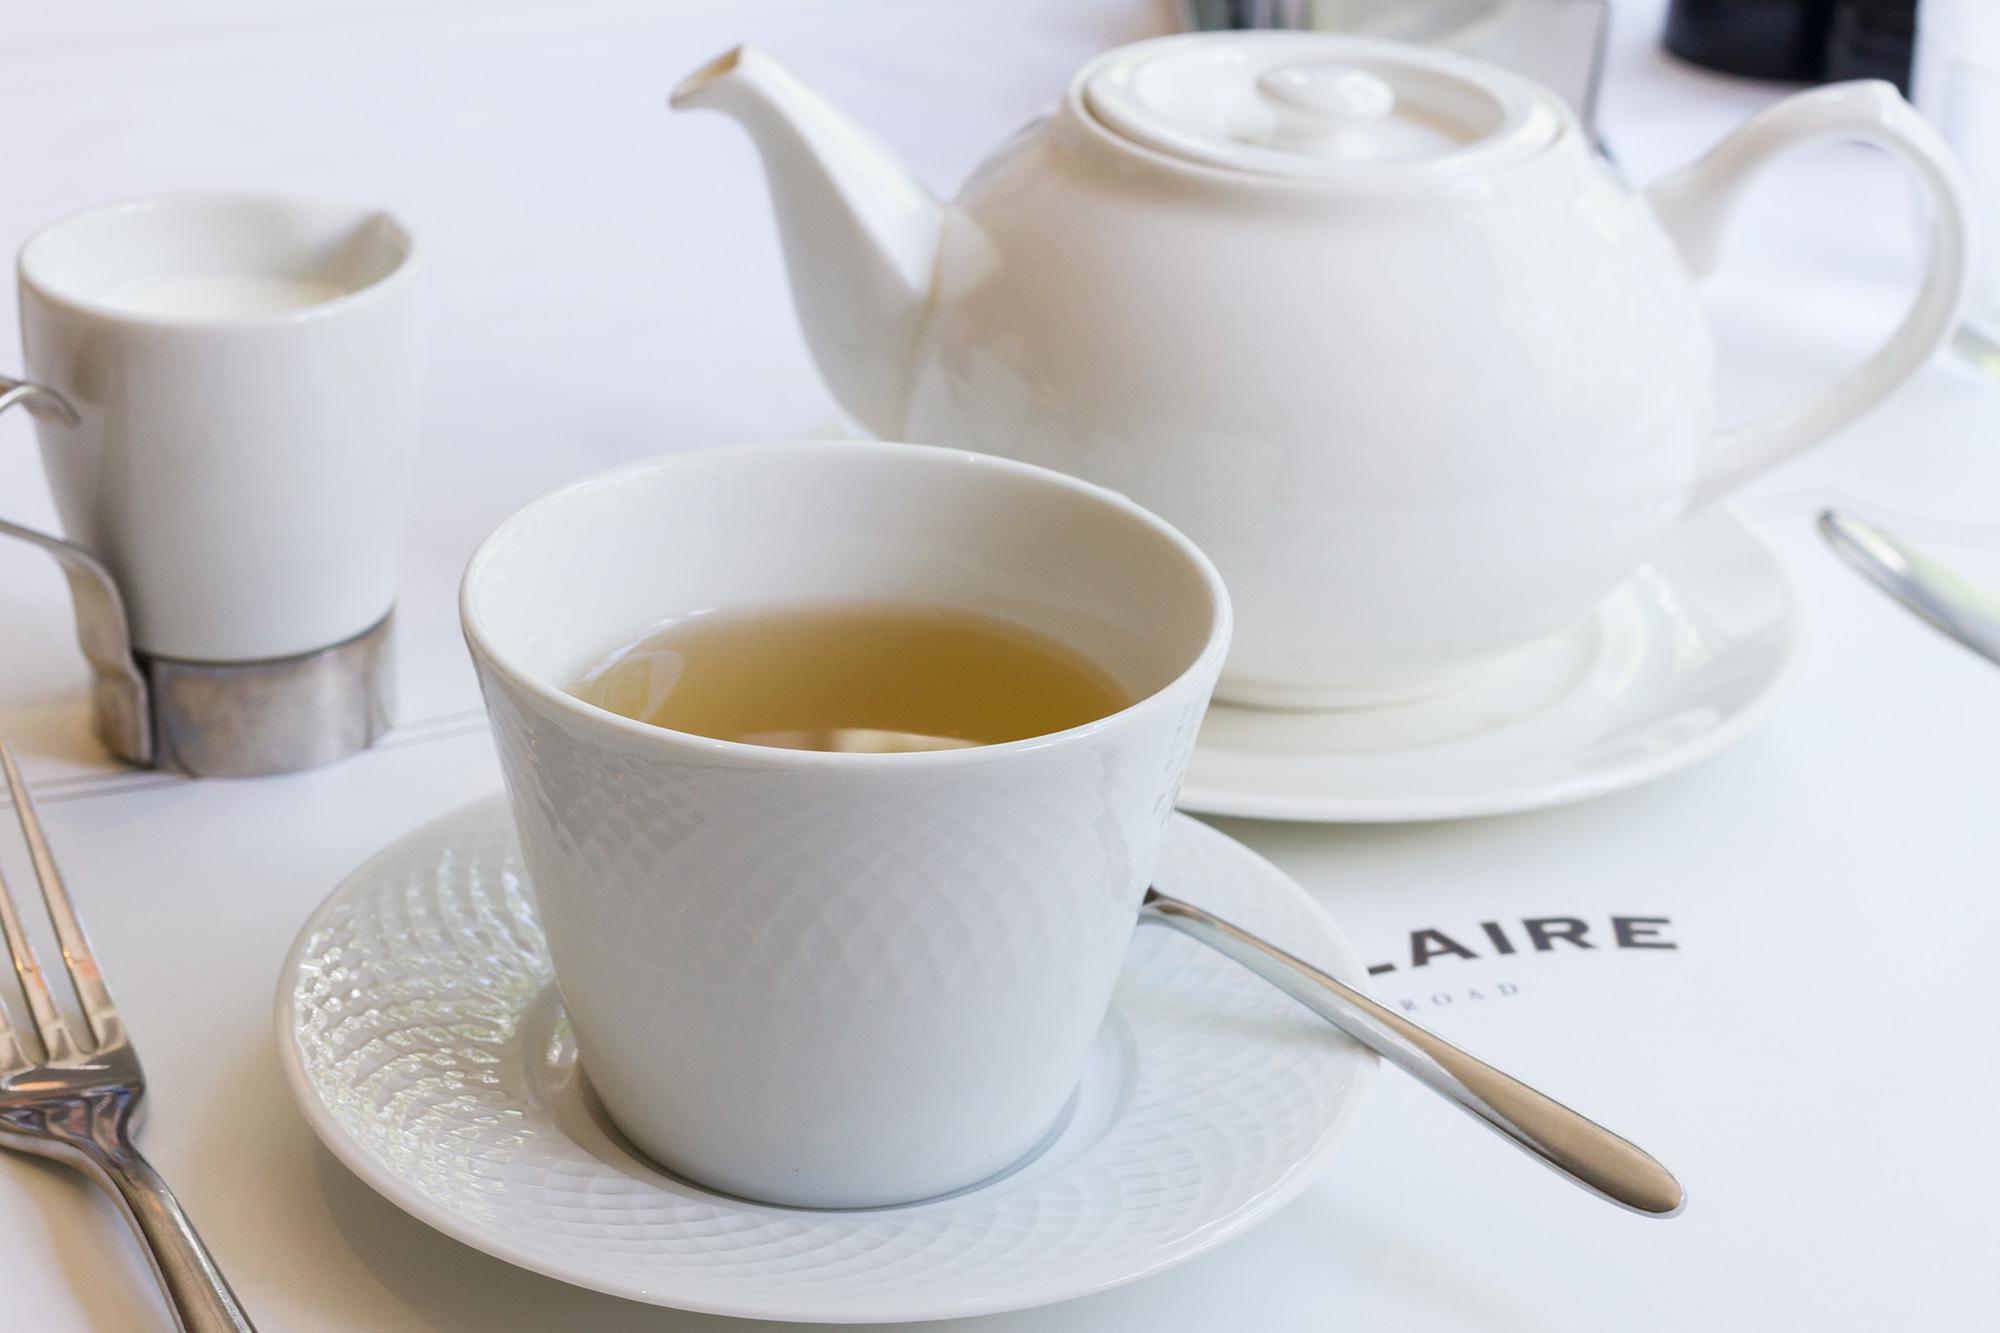 After Noon Tea Oriental Residence Hotel  Cafe Claire คาเฟ่แคลร์ โรงแรมโอเรียนเต็ล เรสซิเดนซ์ กรุงเทพฯ IMG 8251